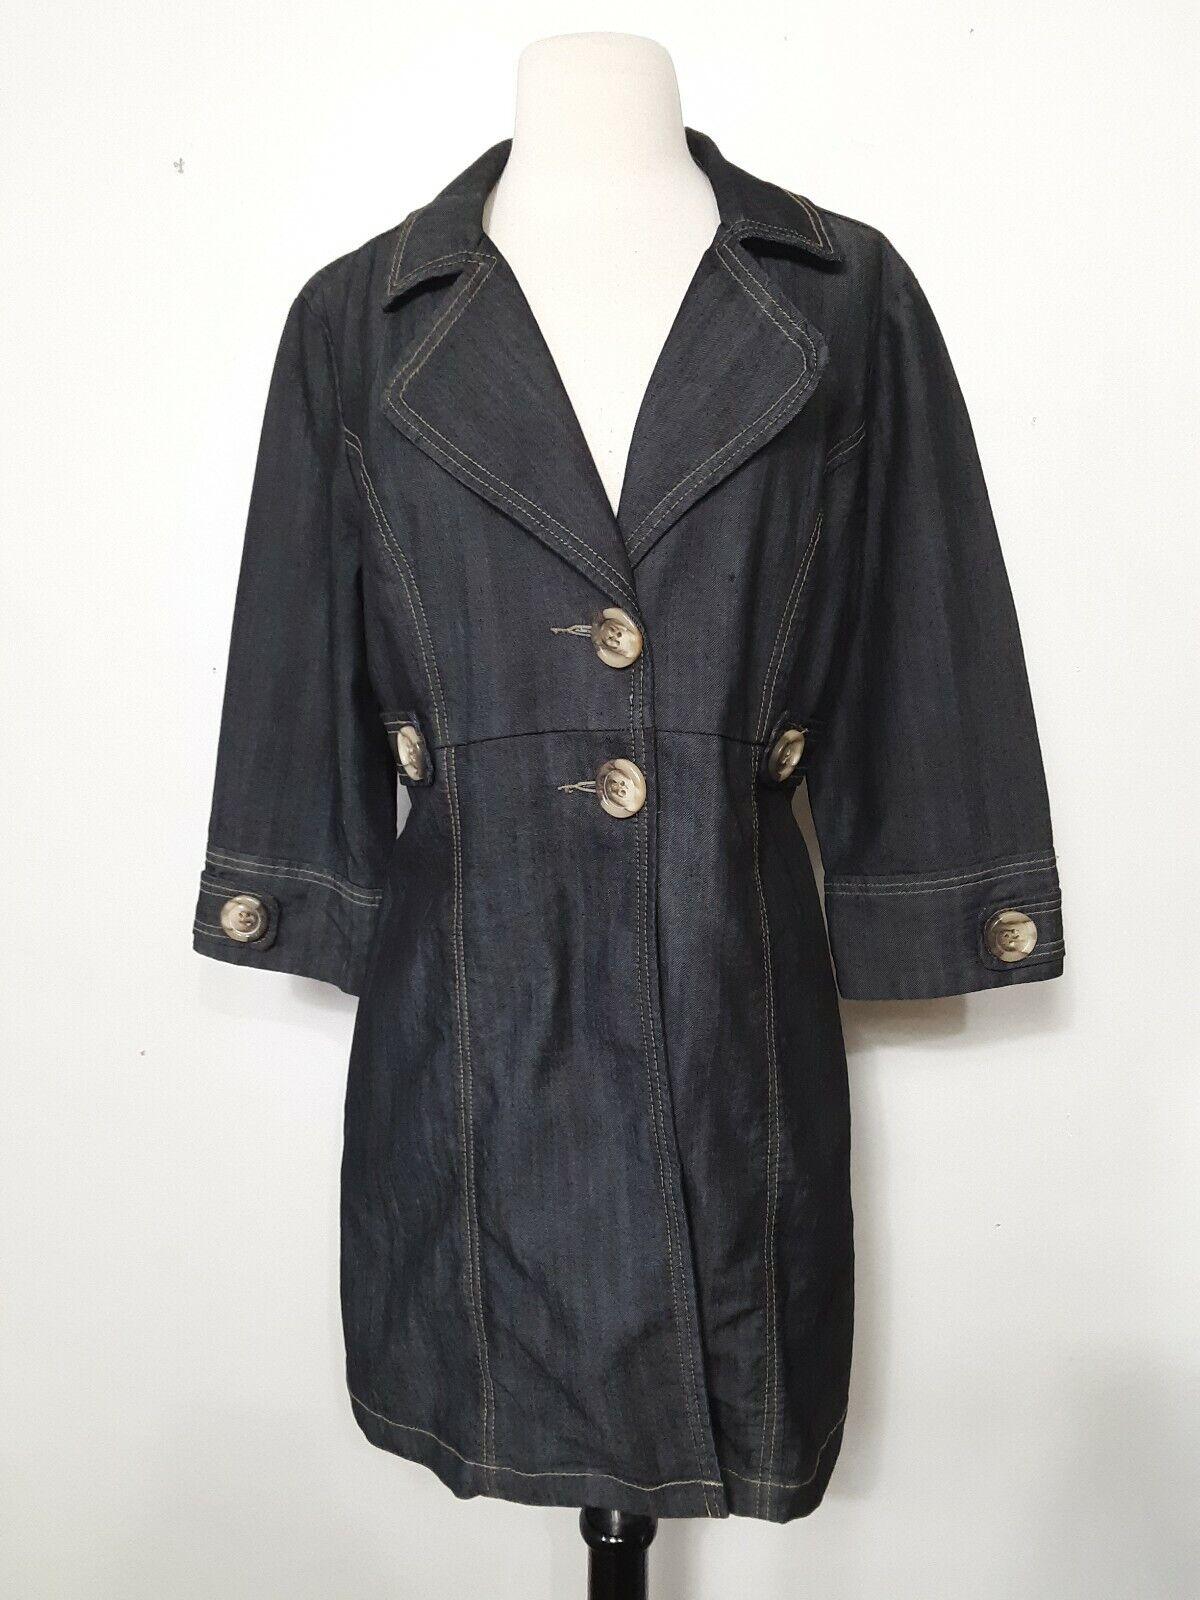 Baccini Blue Jean Jacket Two Button Down 3/4 Sleeve Pockets Women Size L